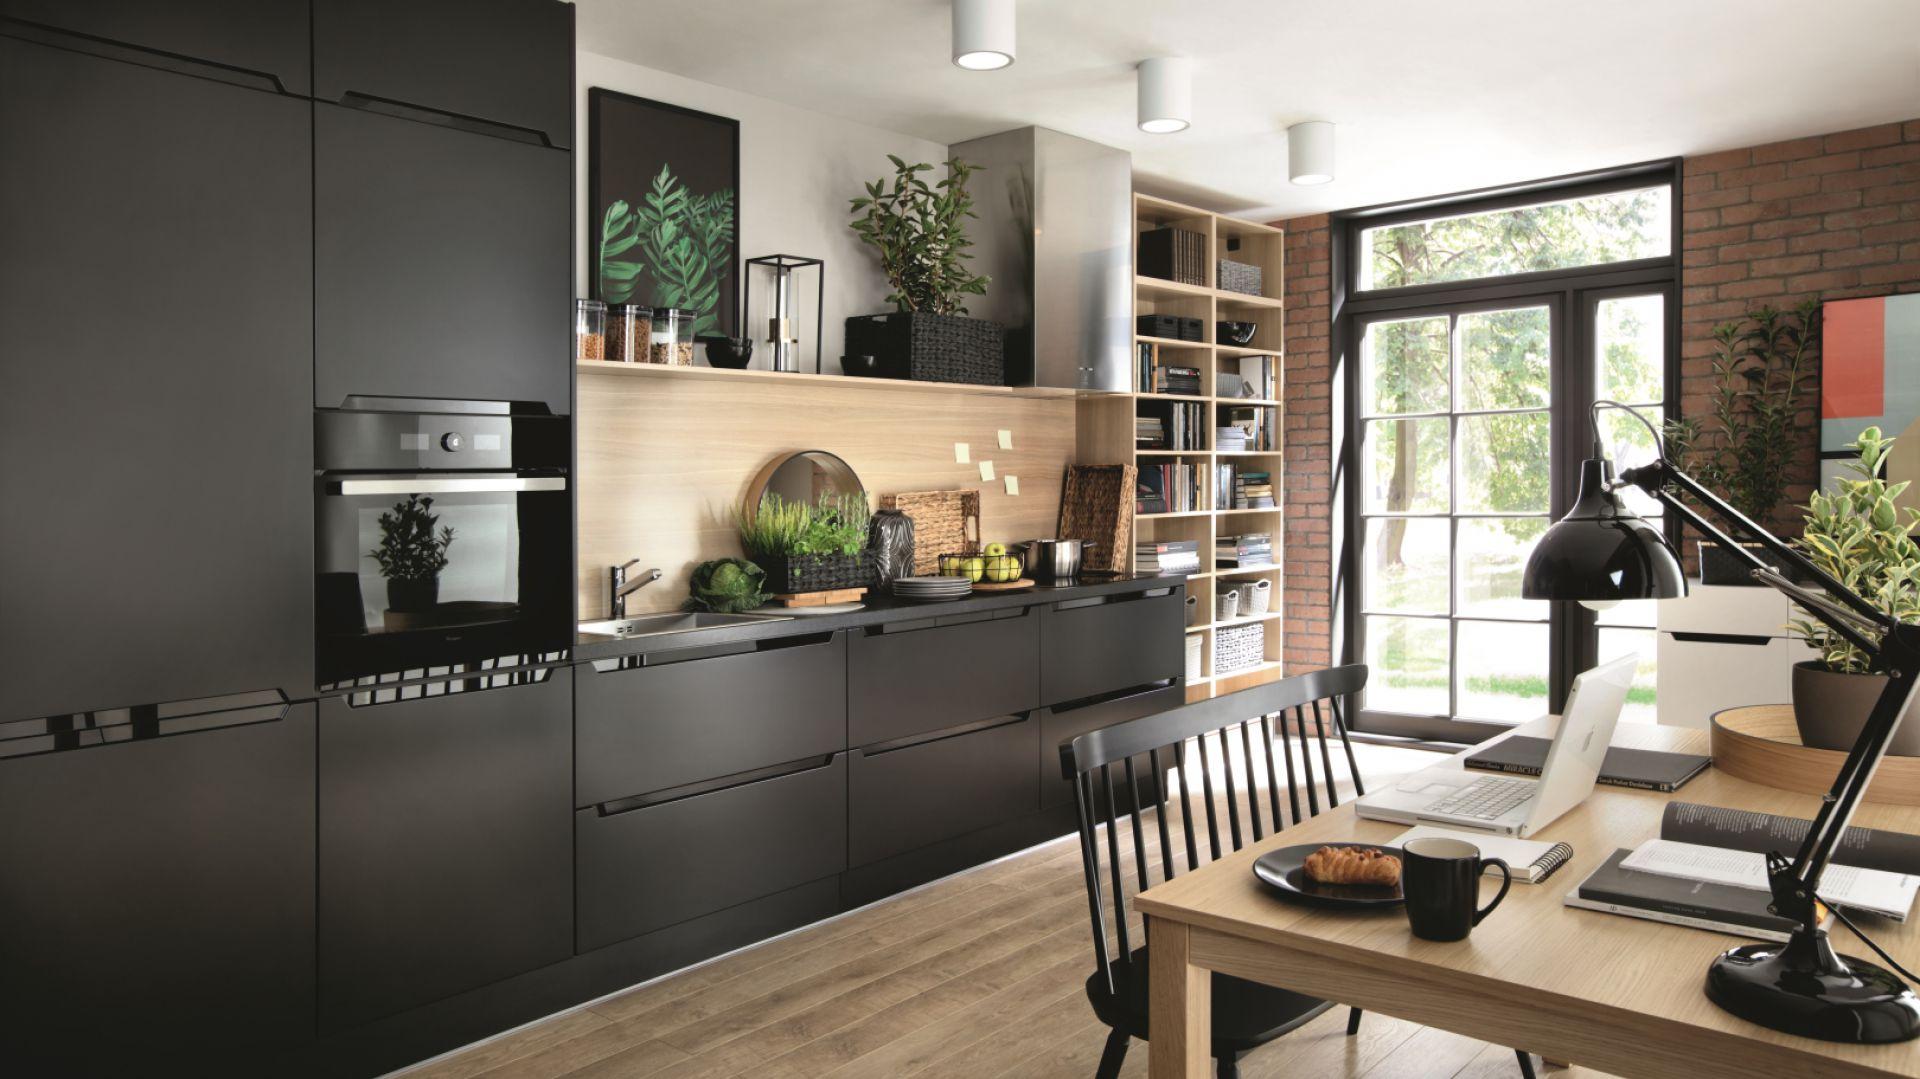 Ikea Ideas Kitchen Modna Kuchnia Gorące Trendy Na 2018